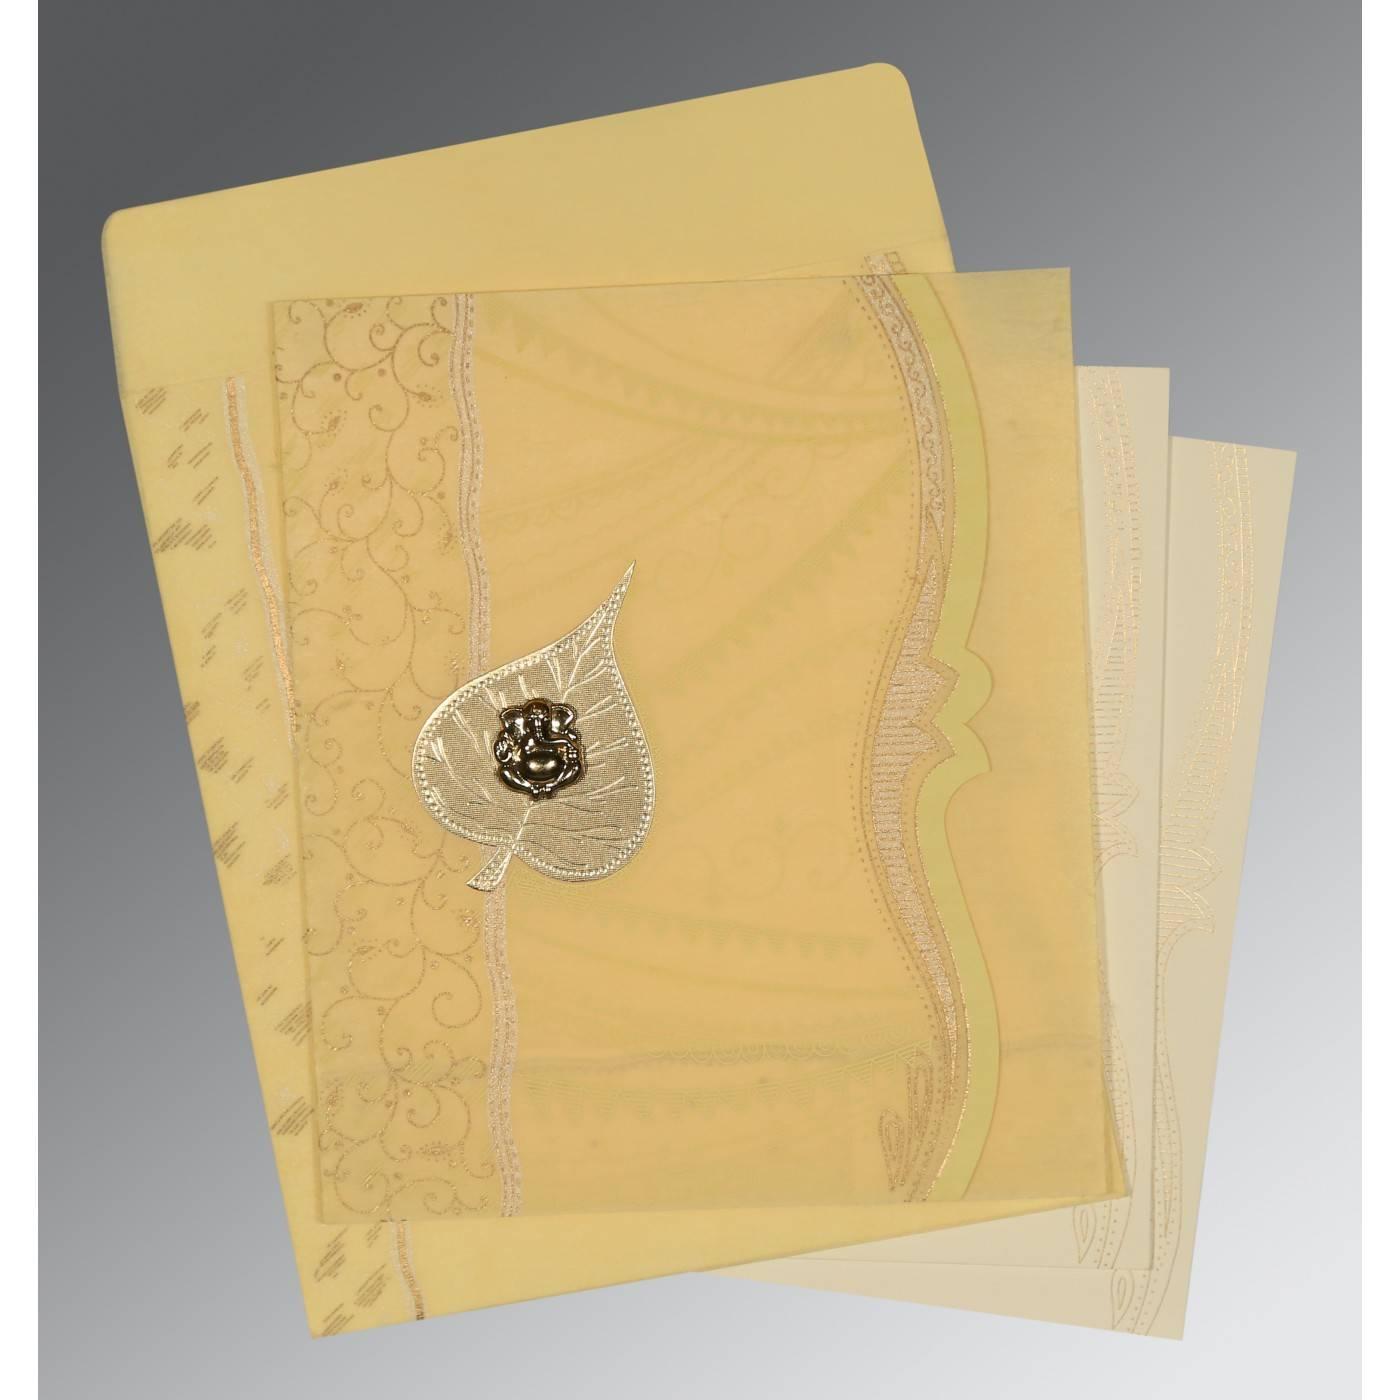 MUSTARD YELLOW SHIMMERY EMBOSSED WEDDING CARD : CW-8210G - IndianWeddingCards